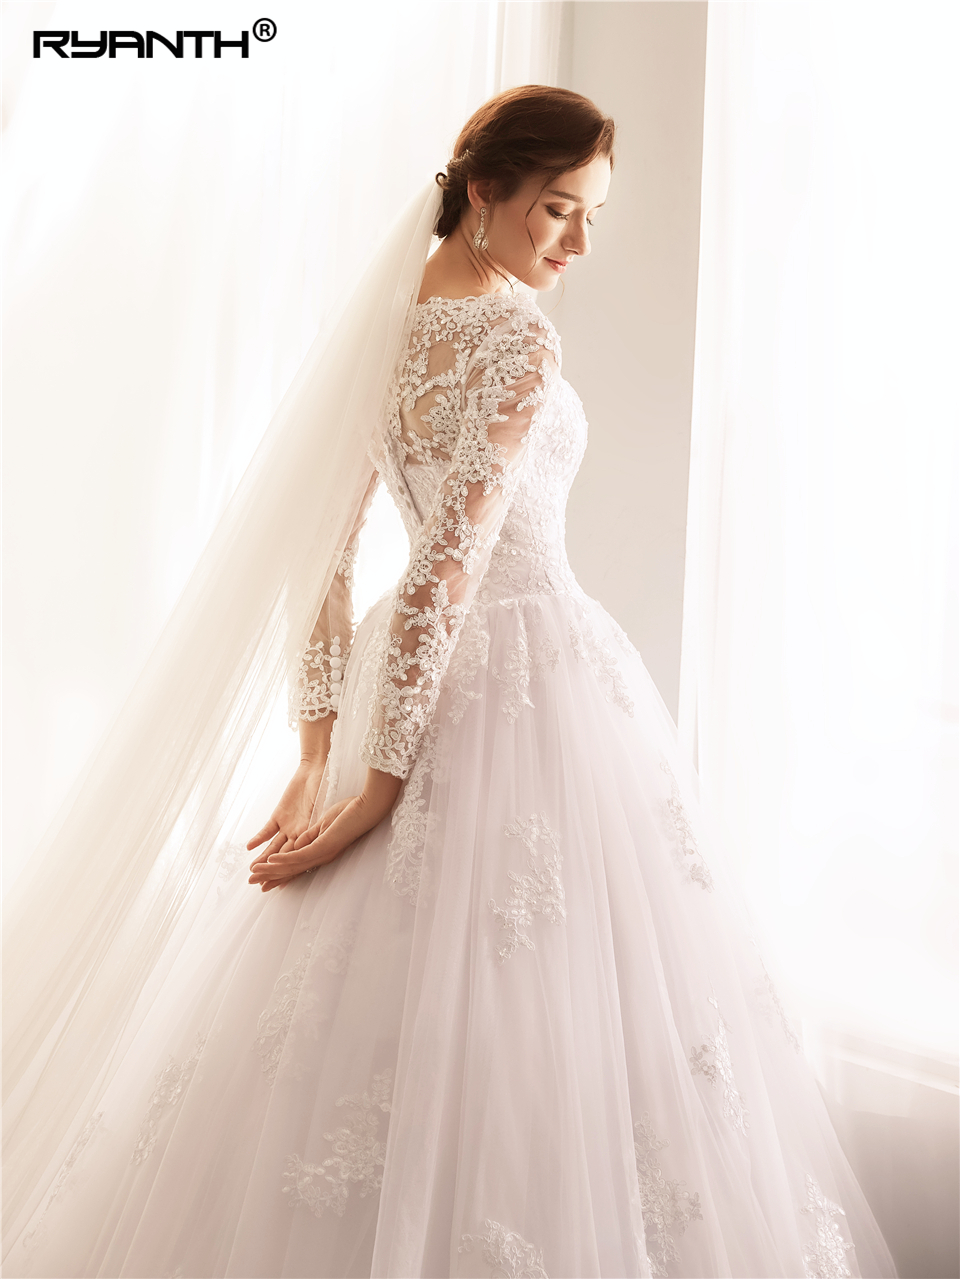 Custom Made Vestido De Noiva Cheap High Neck Long Sleeves Lade A Line Wedding Dress 2019 New Arrival Bohemian Robe De Mariee in Wedding Dresses from Weddings Events